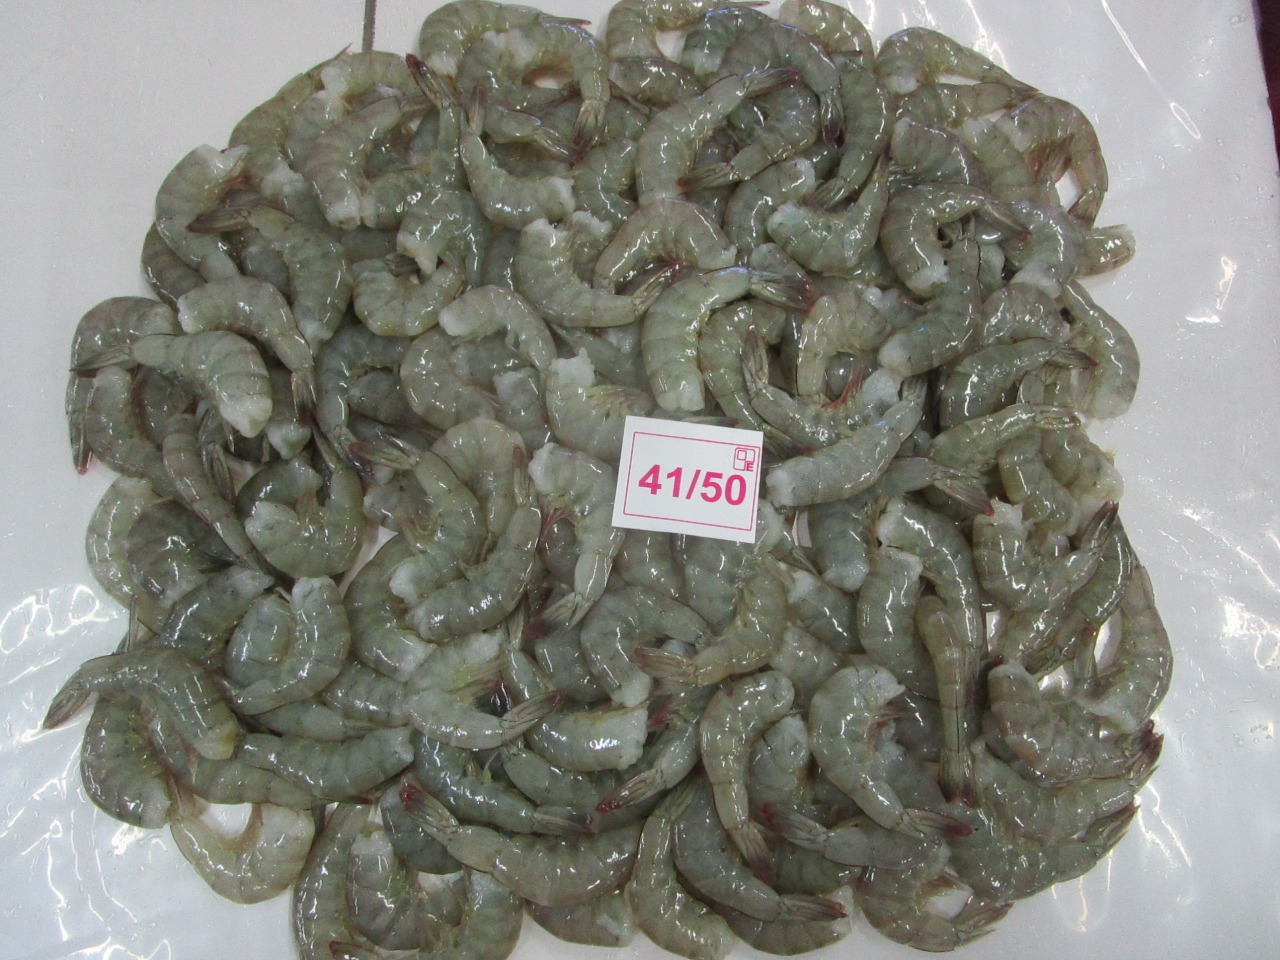 Frozen vannamei shrimps export best qulaity seafood supply India